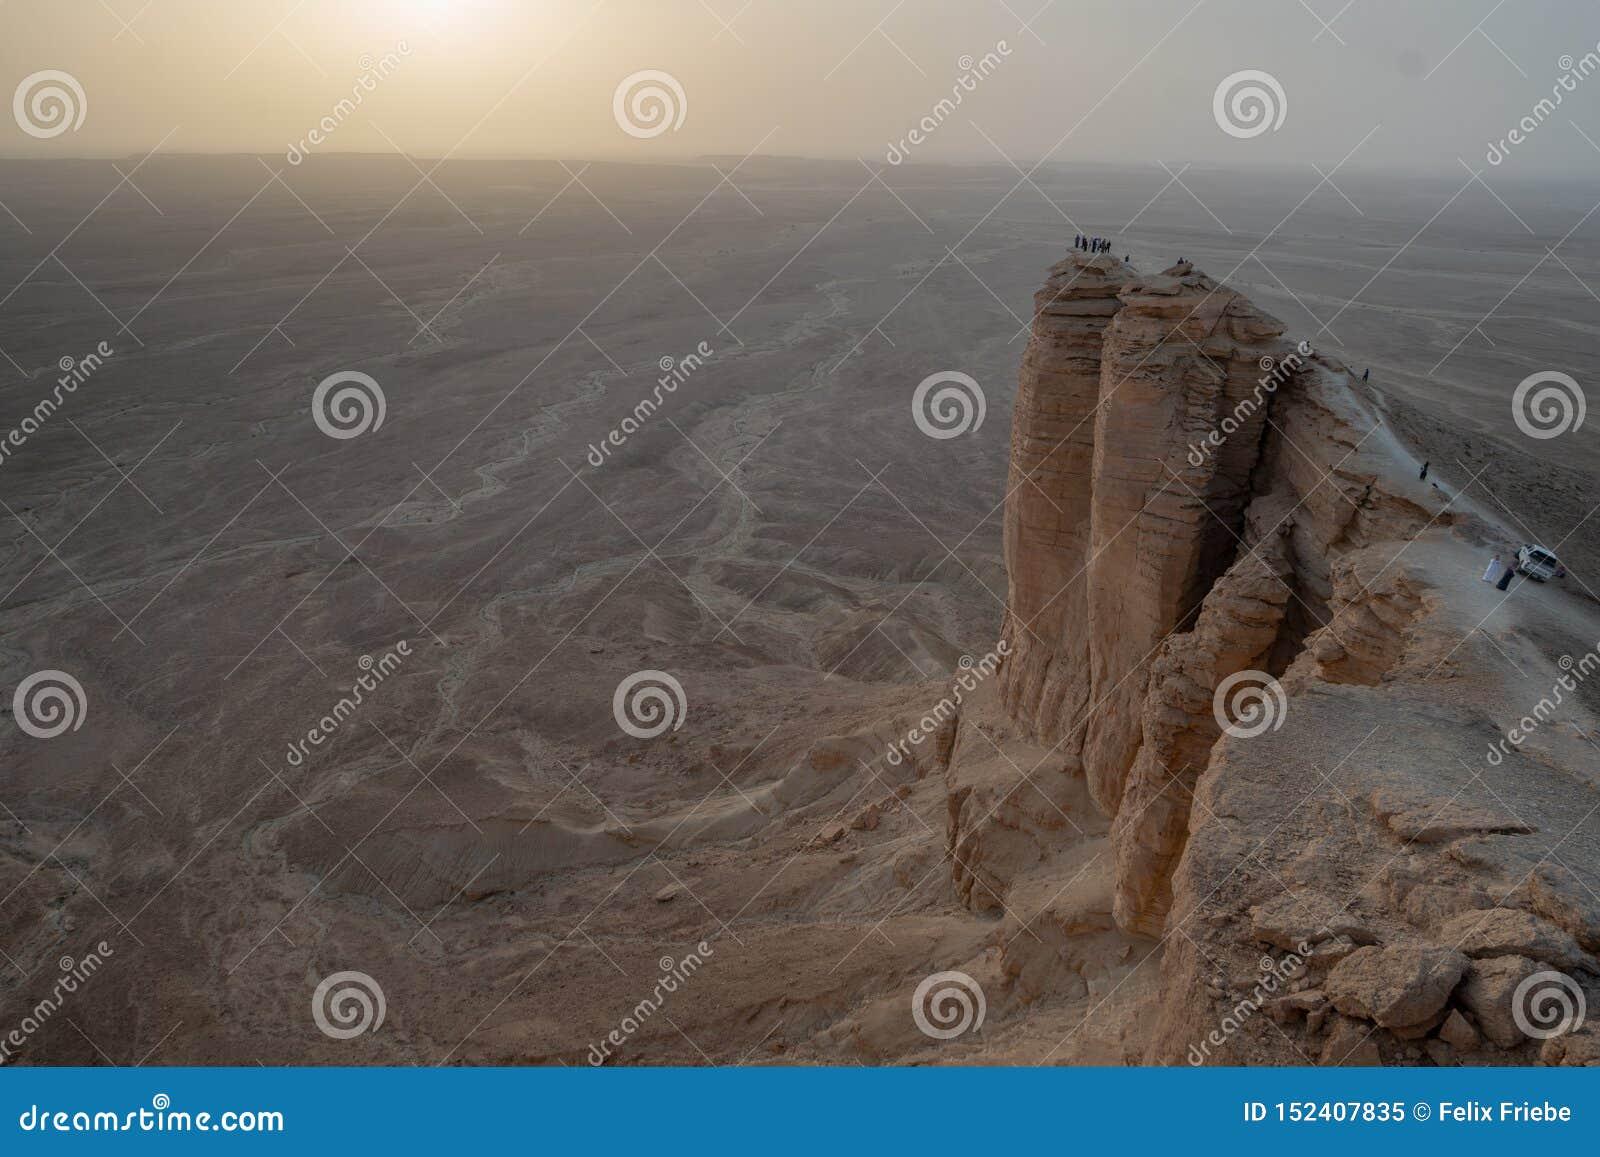 Sonnenuntergang am Rand der Welt nahe Riad in Saudi-Arabien